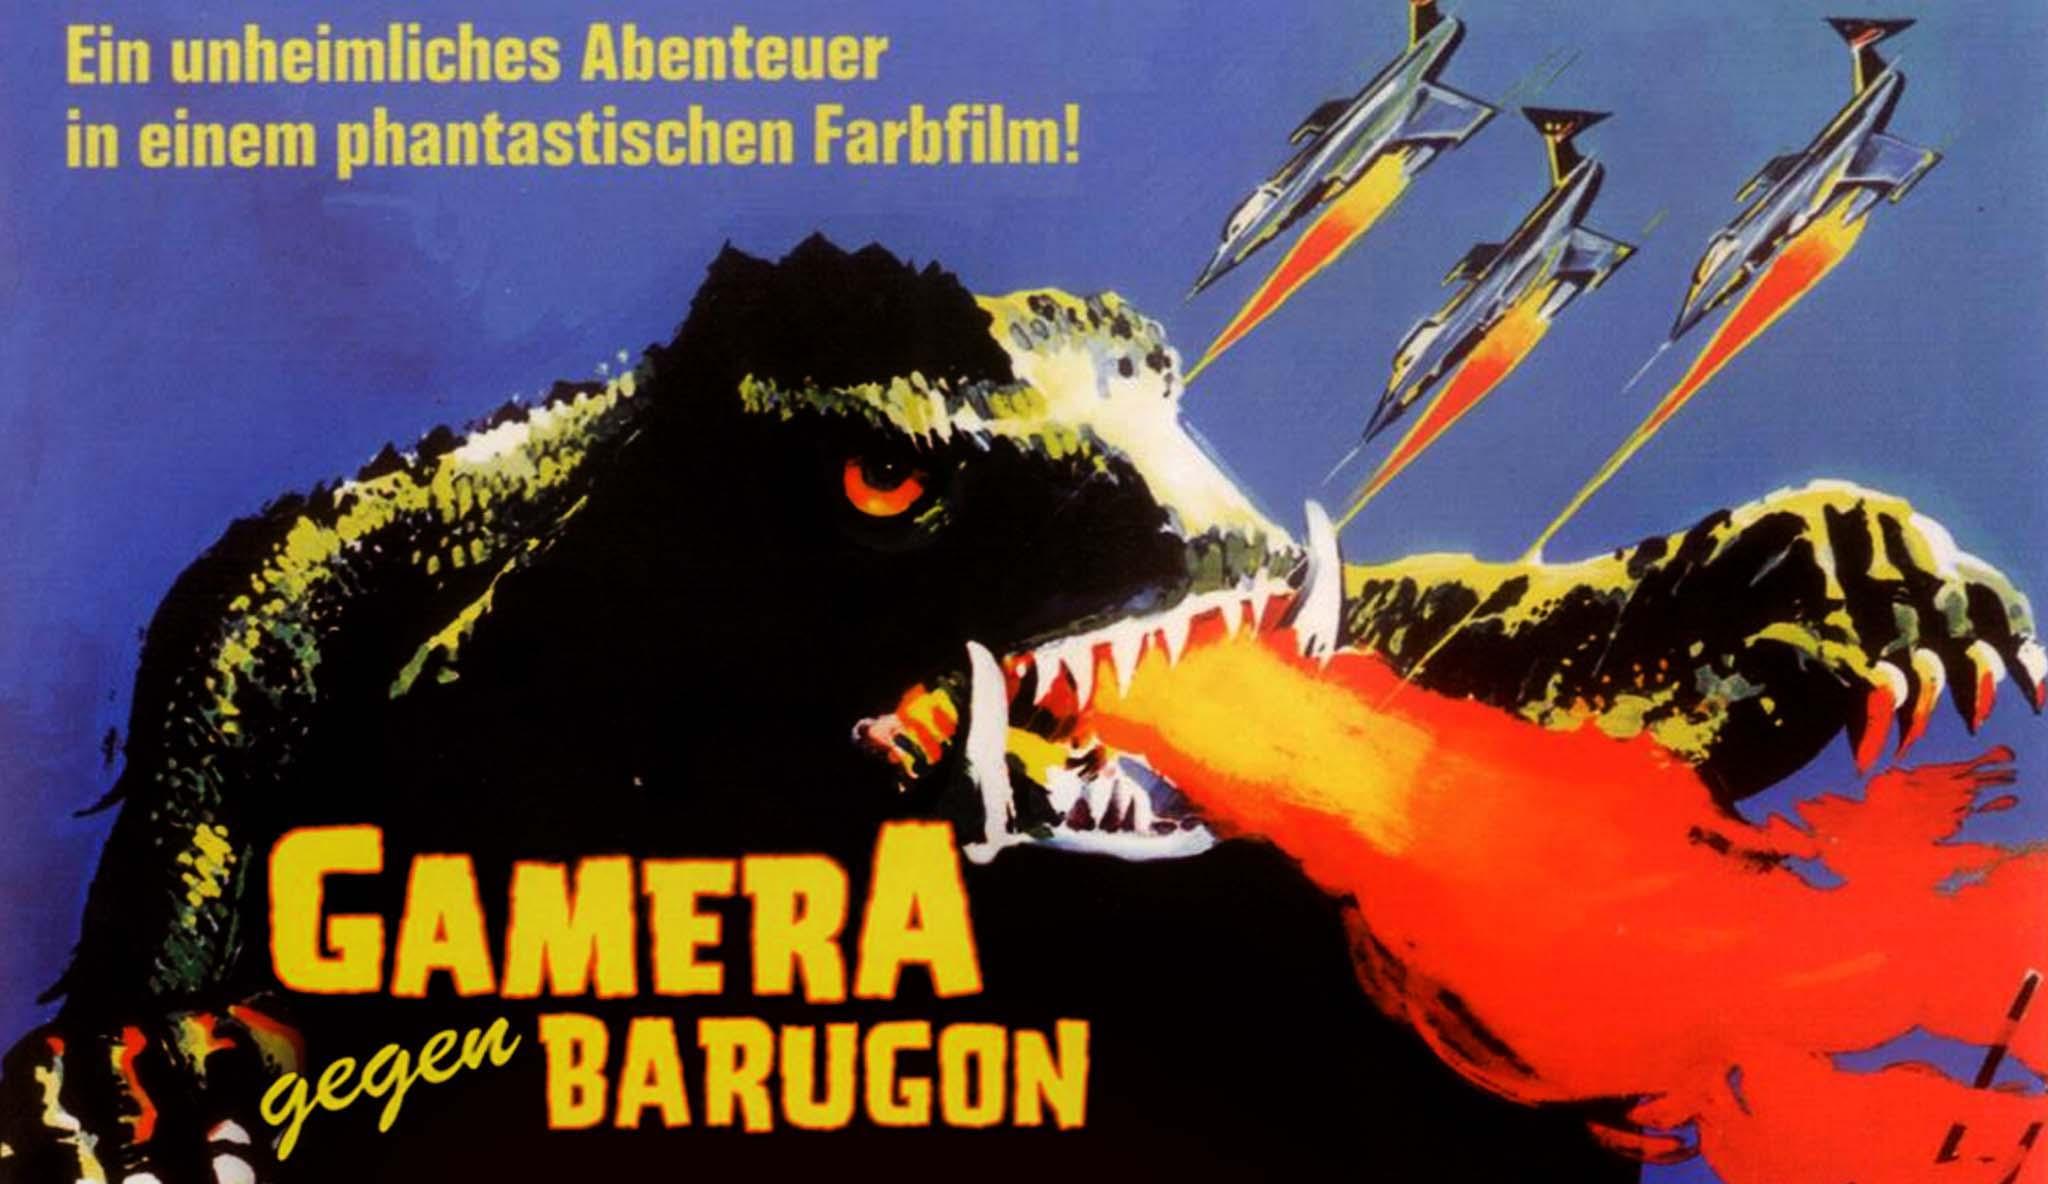 gamera-gegen-barugon-frankensteins-drache-aus-dem-dschungel\widescreen.jpg